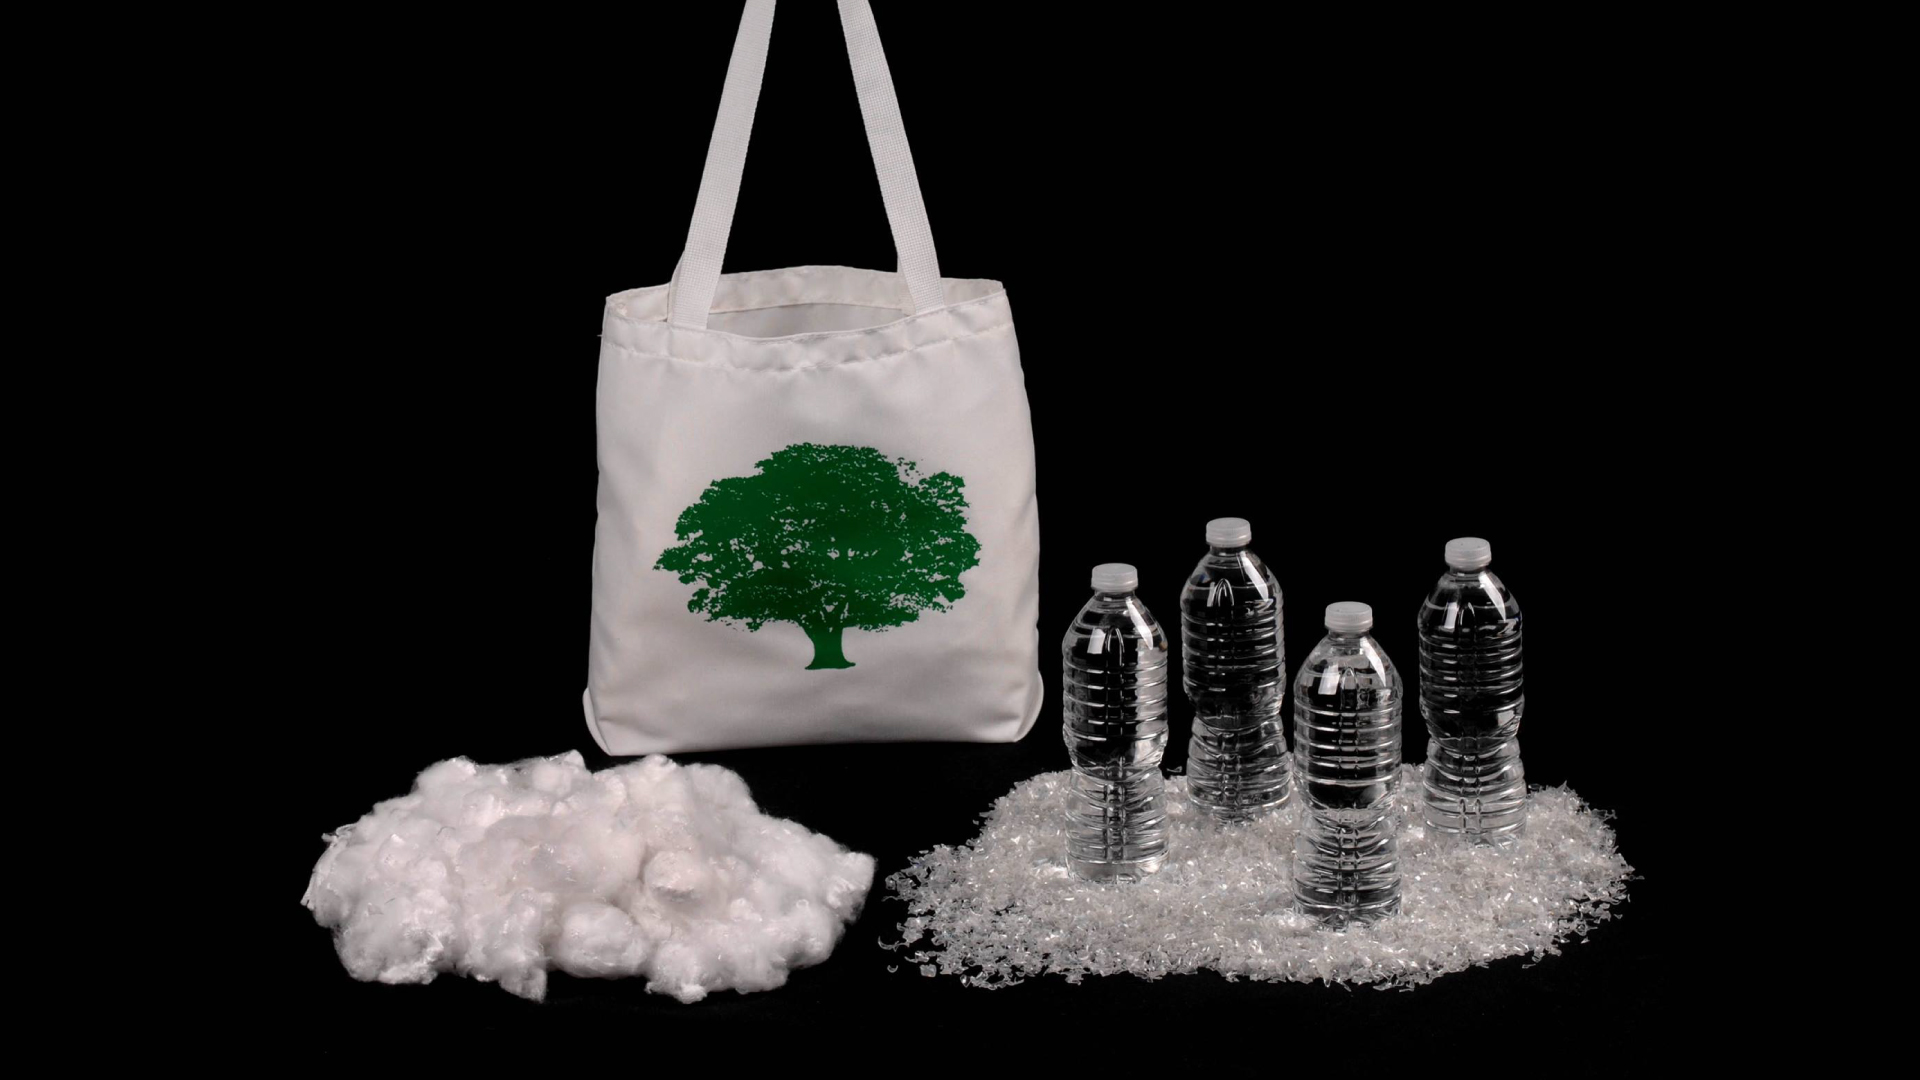 eco-friendly envirotote recycled tote bag